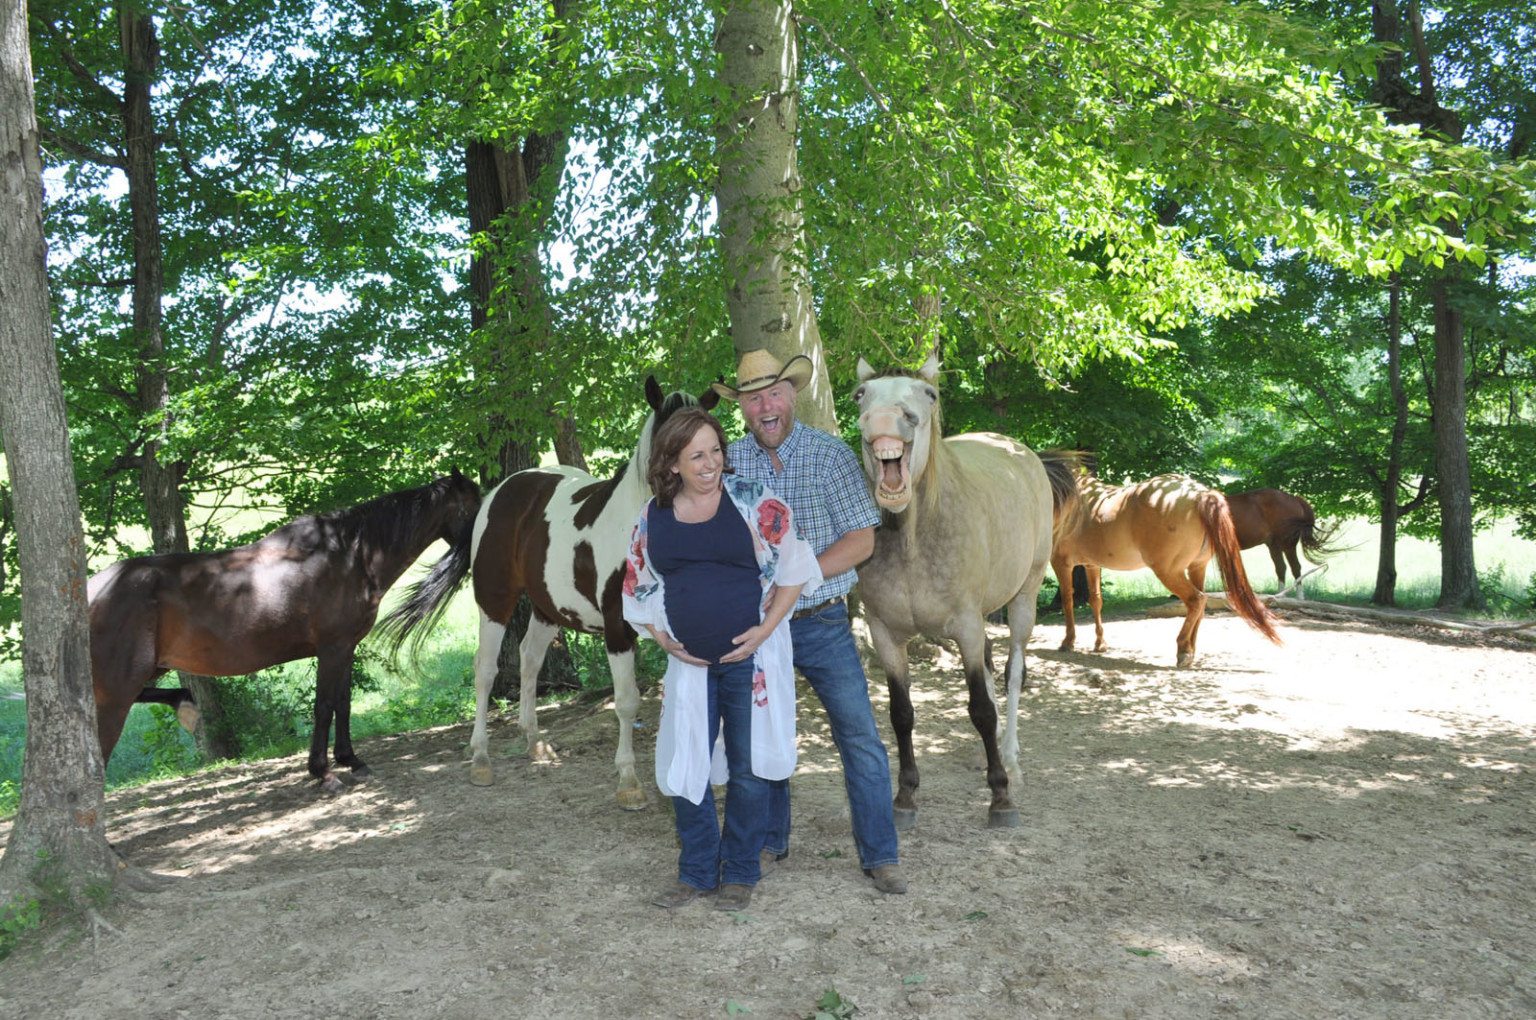 ▲▼搶鏡的馬。(圖/翻攝自Facebook/Photography By Kristen)